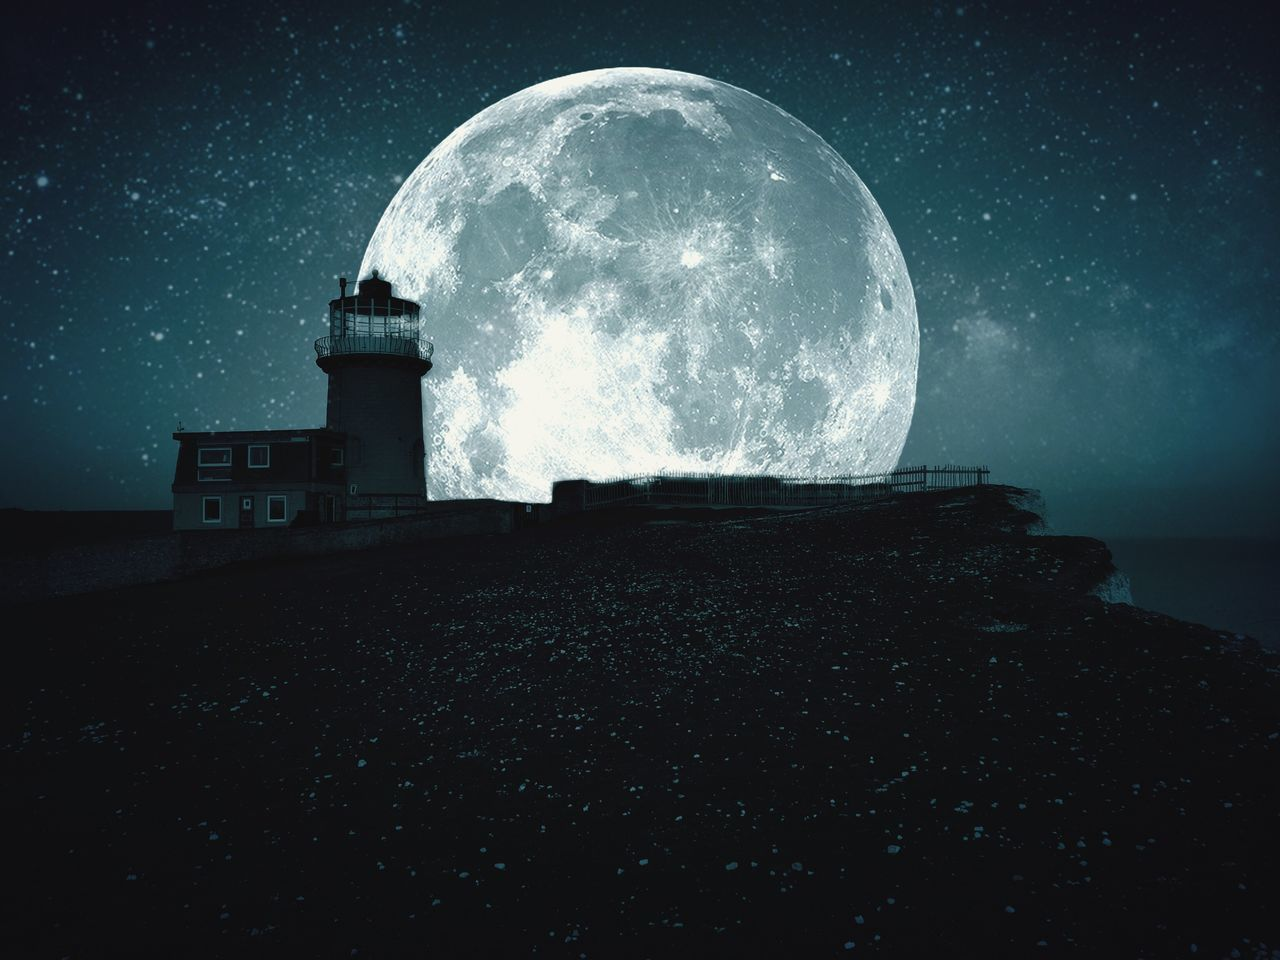 Beachy Head cliffs Beachy Head Cliffs Sea Moon Moonlight Enjoying The View IPhoneography Eastbourne EyeEm Bestsellers